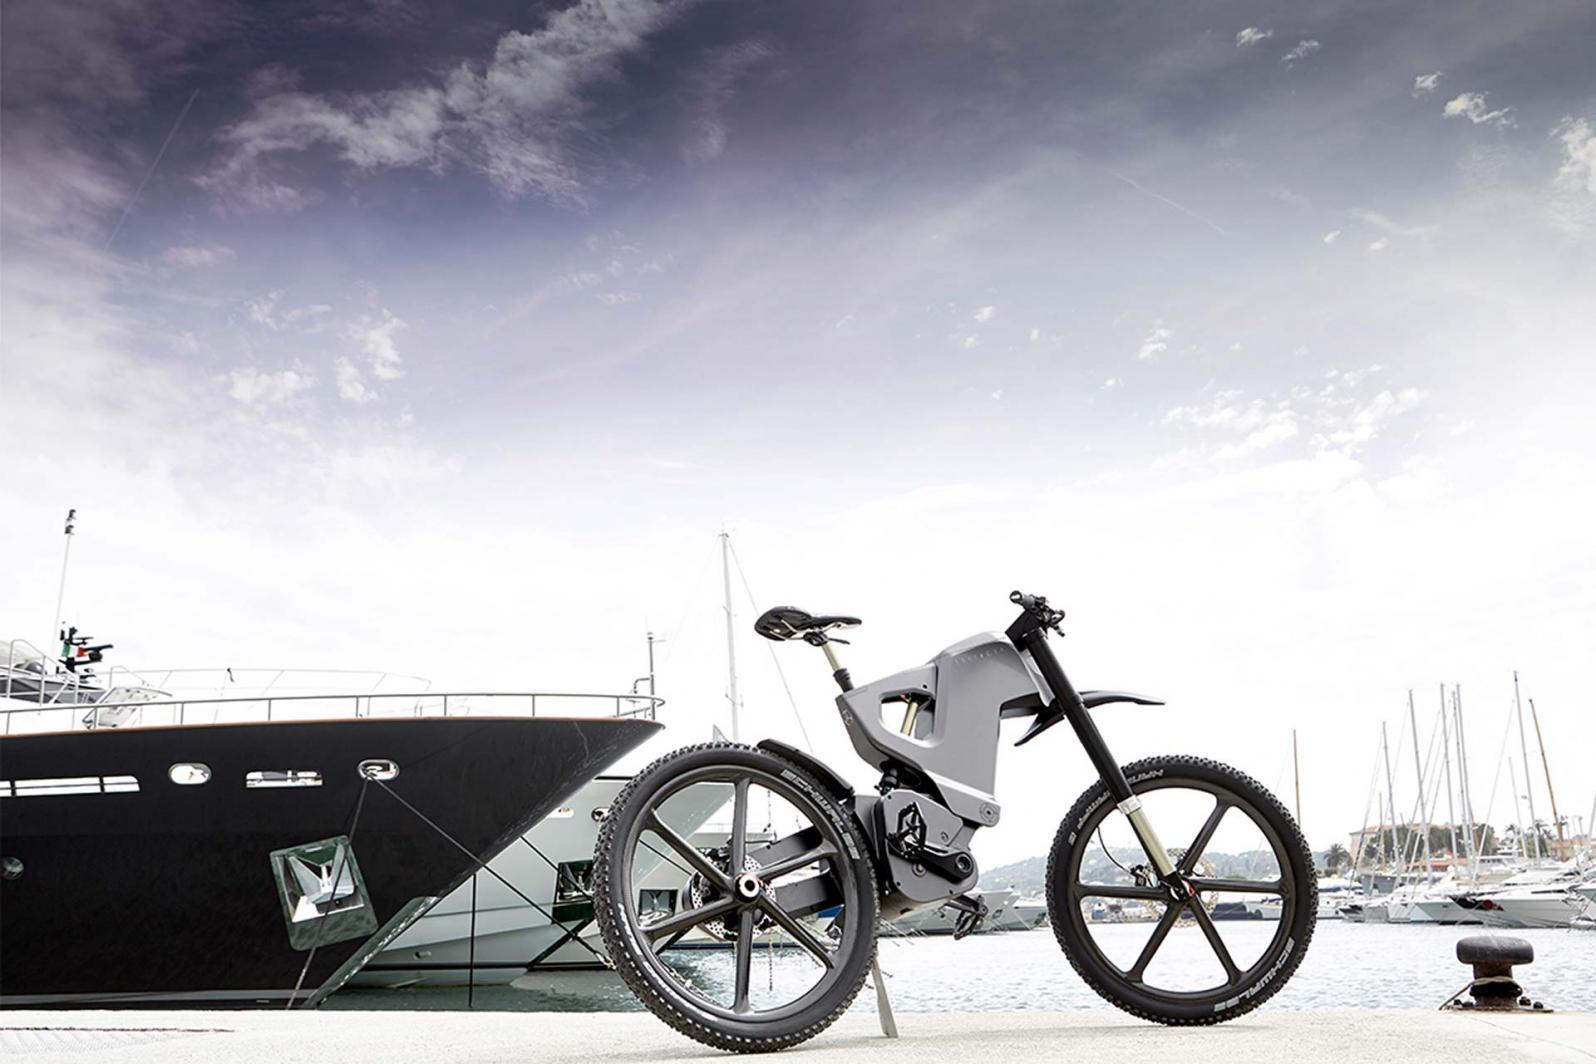 Foto Trefecta Drt L E Bike Quot Da Guerra Quot